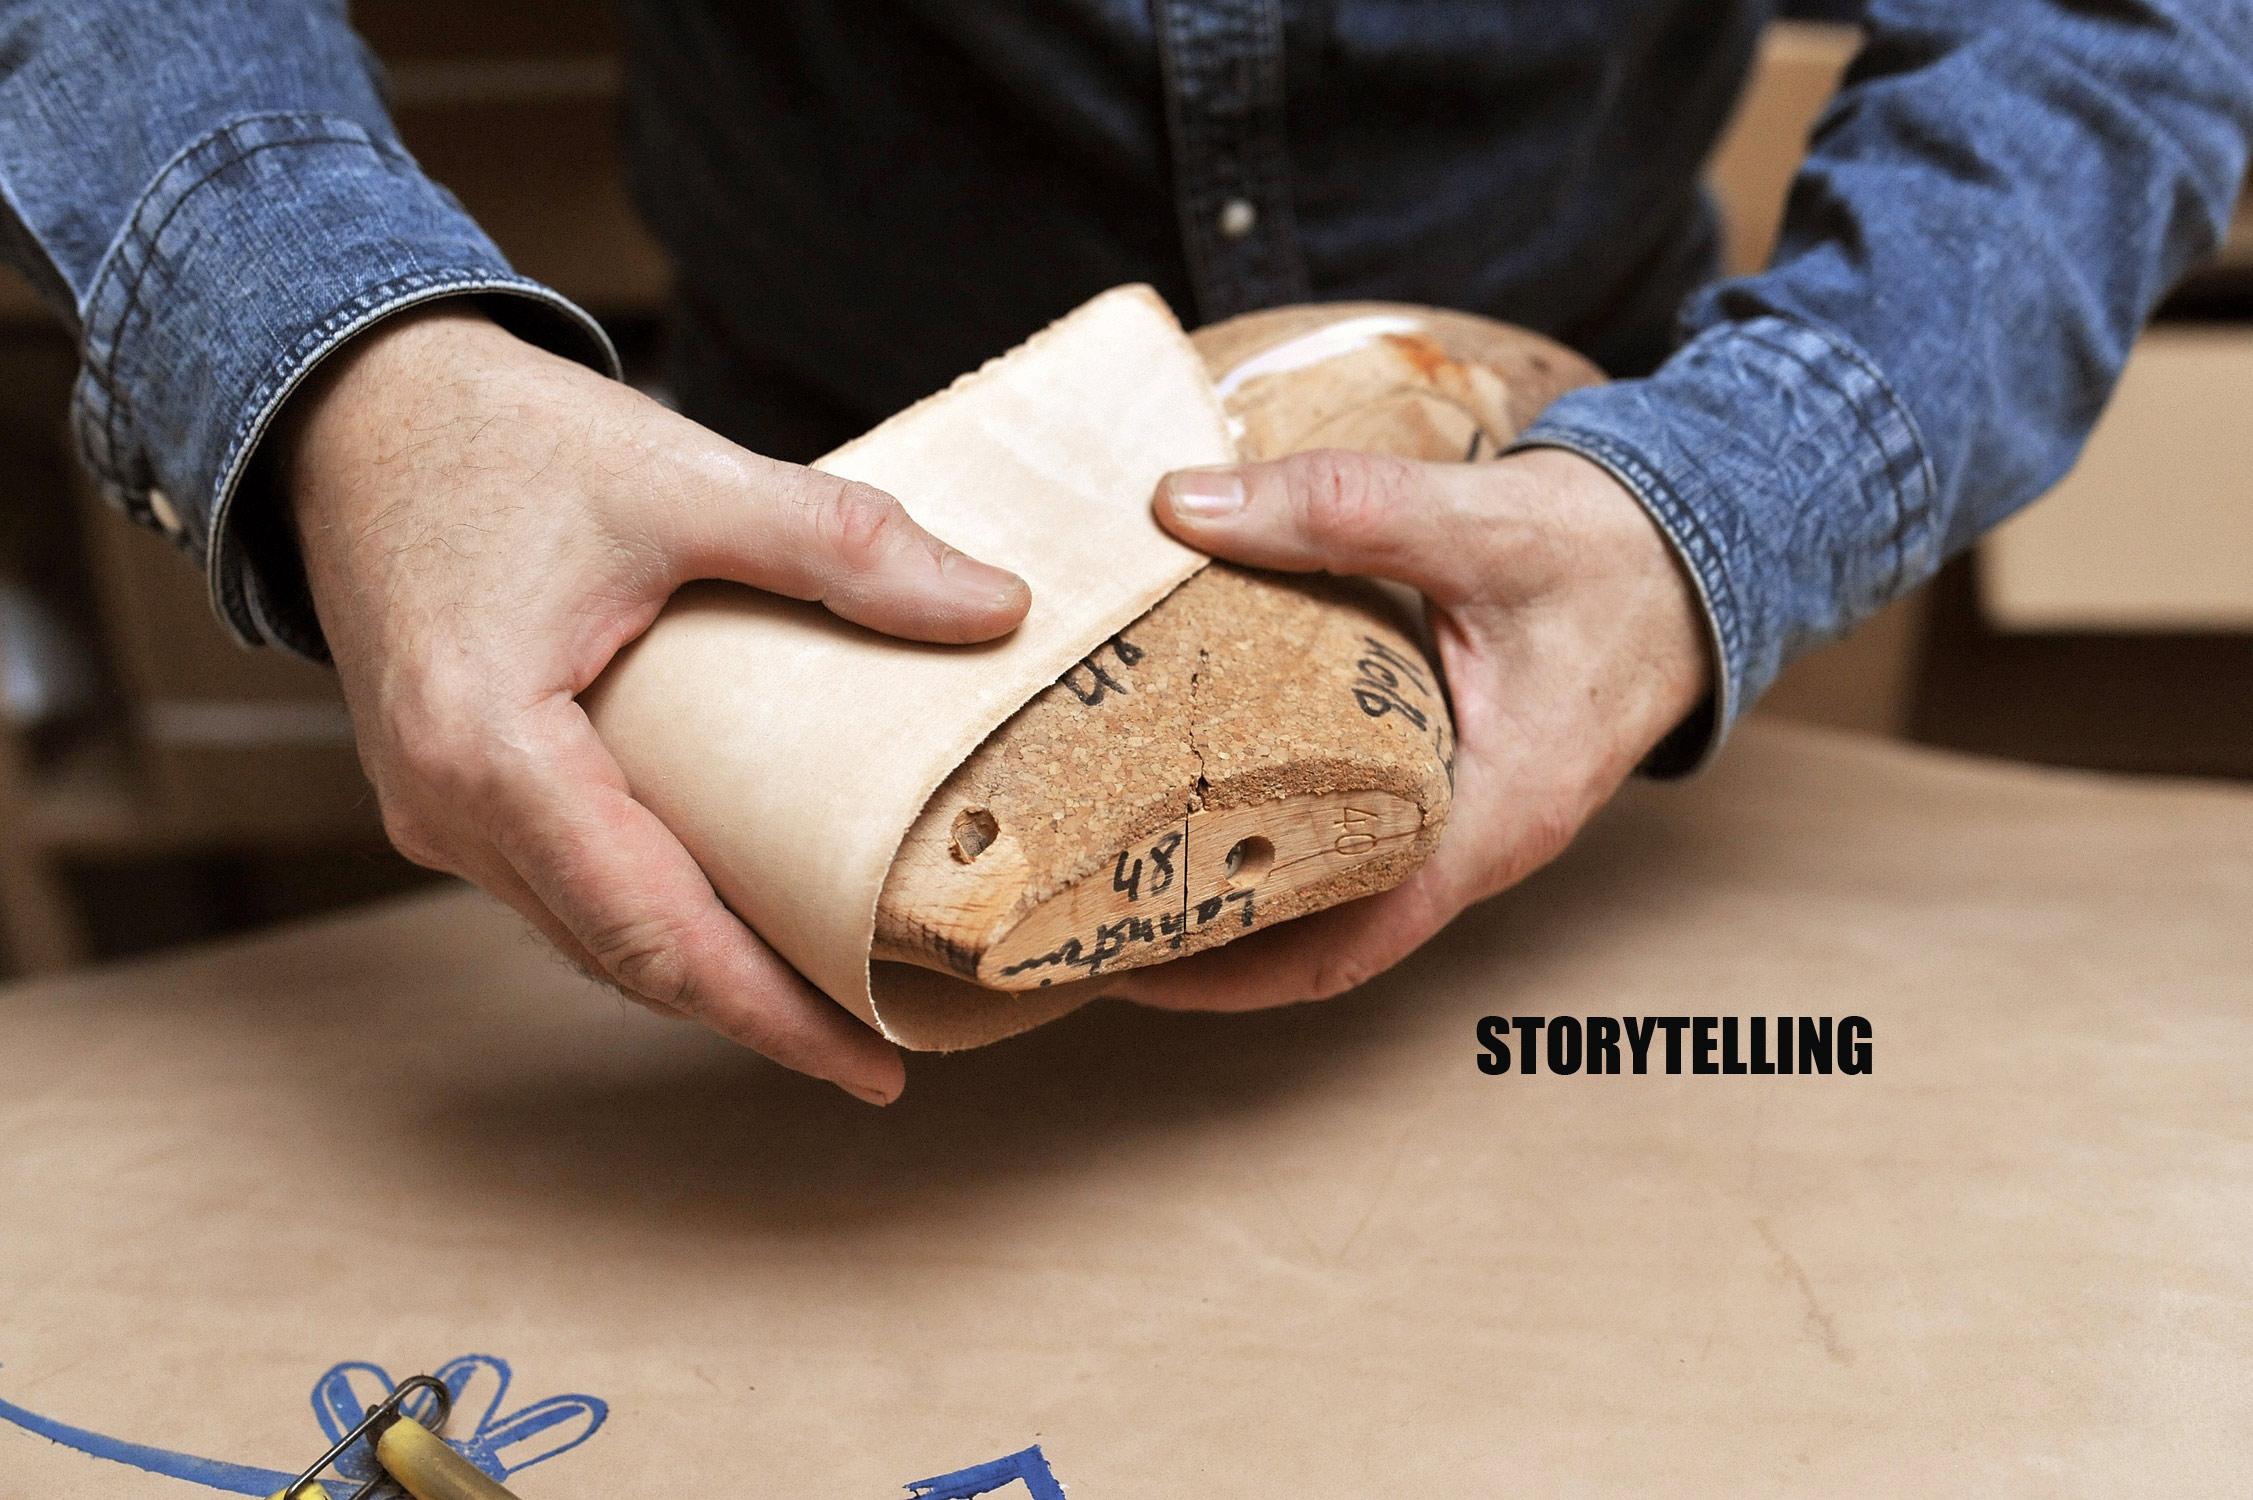 nicole-bouillon-fotografie-storytelling-koblenz